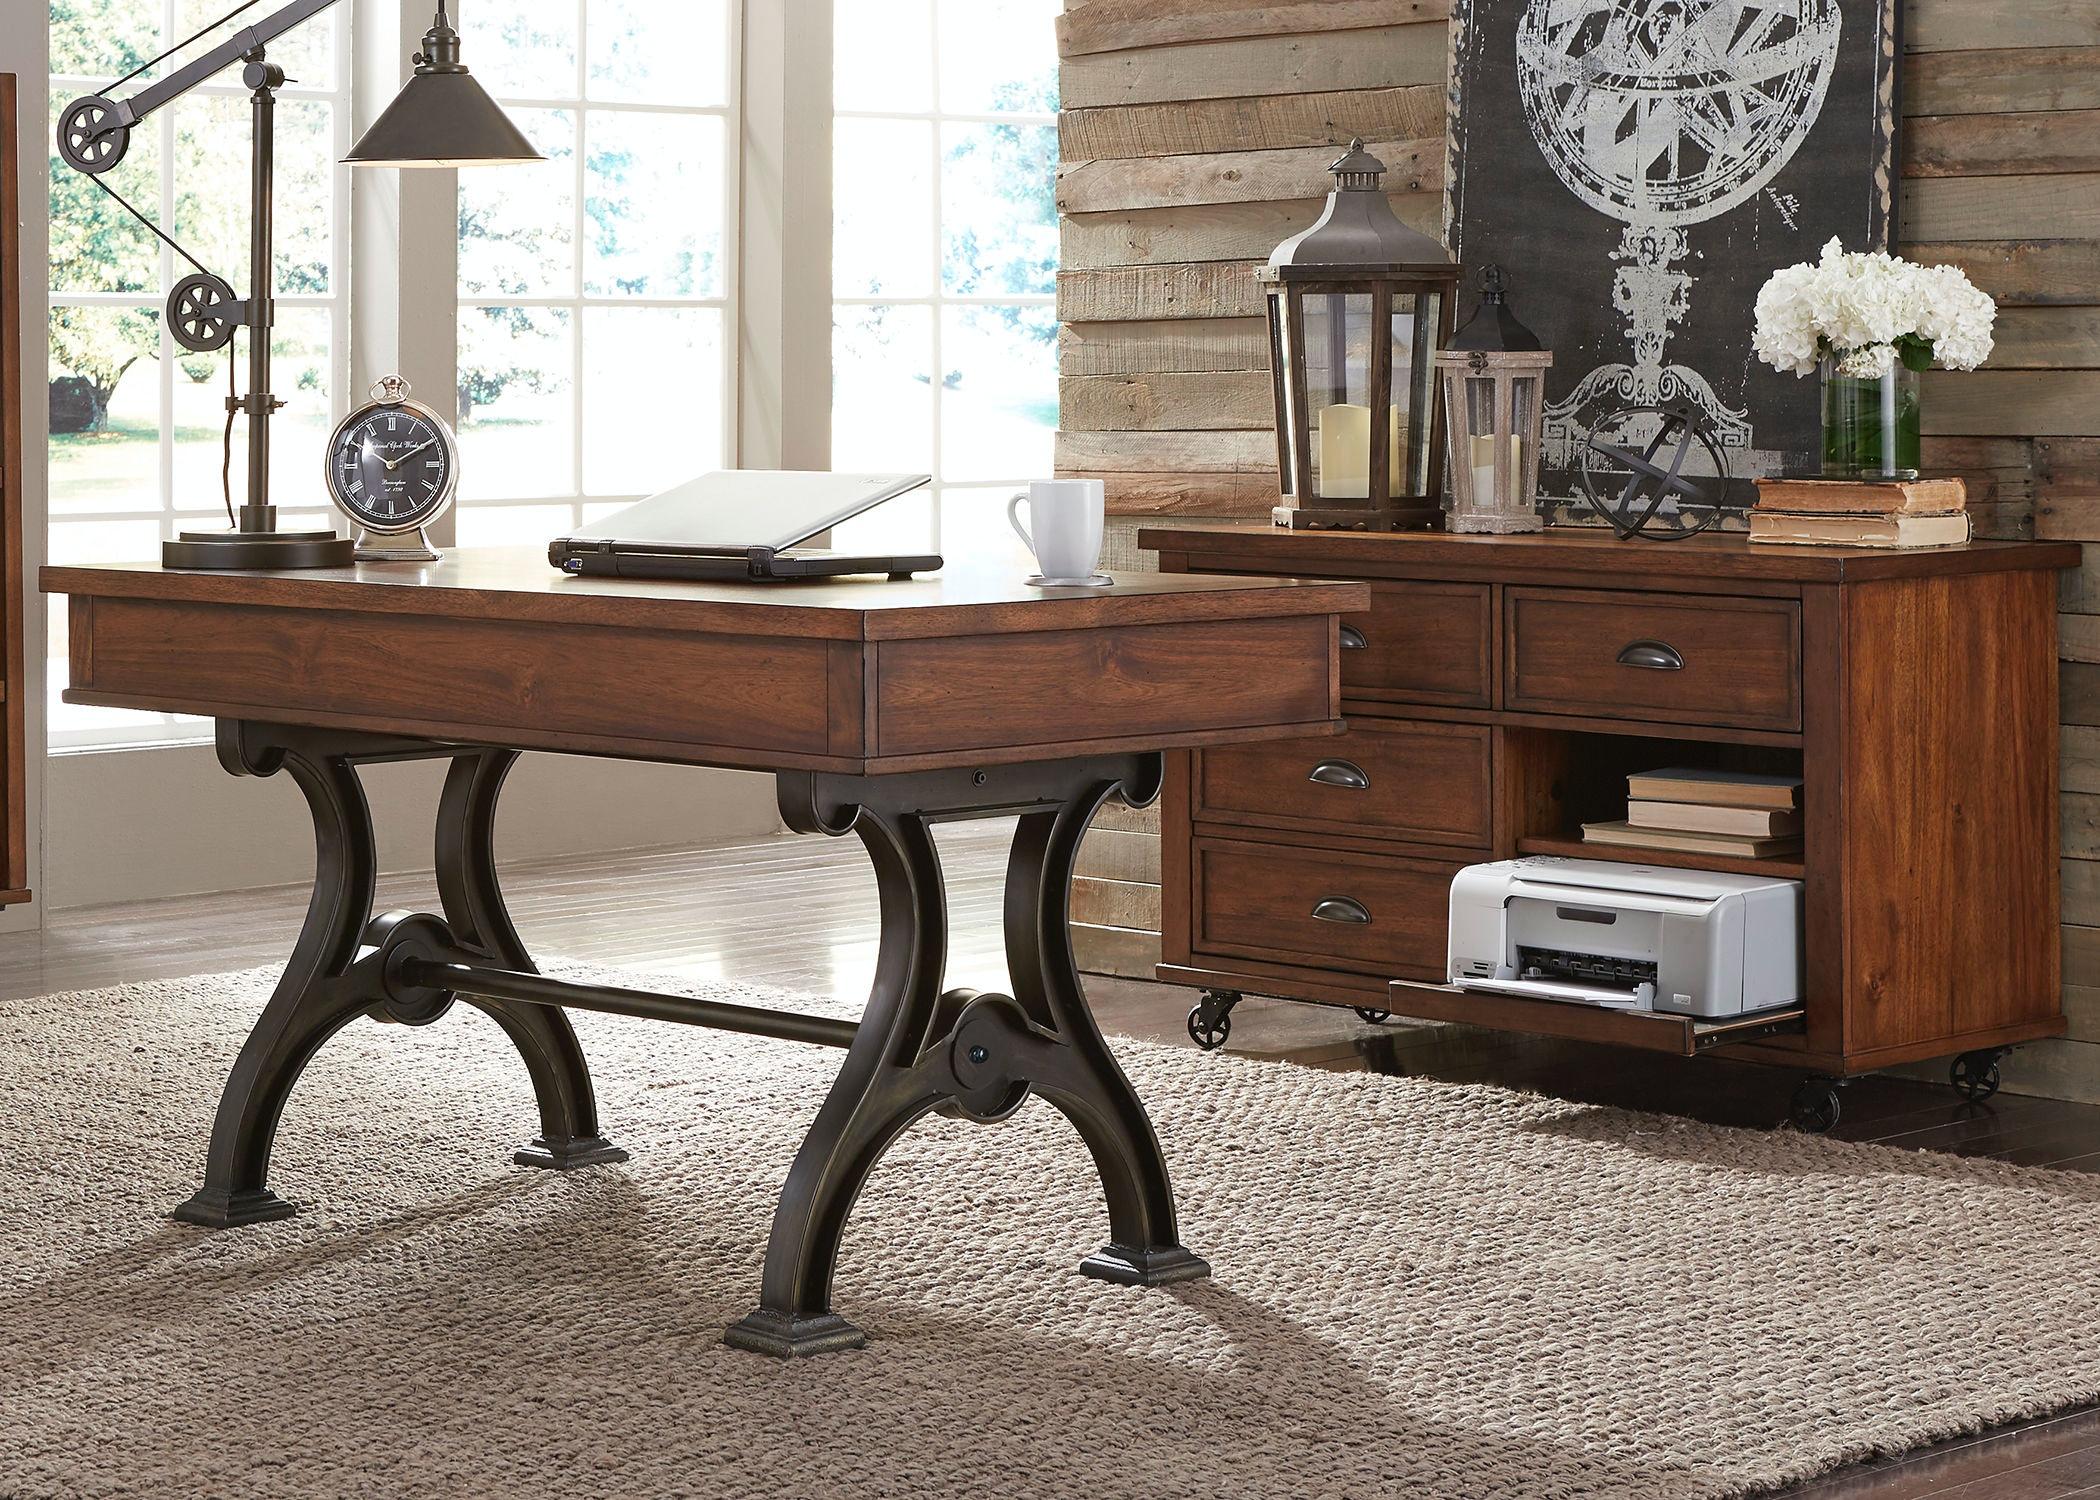 Liberty Furniture Home fice plete Desk 411 HO CDS